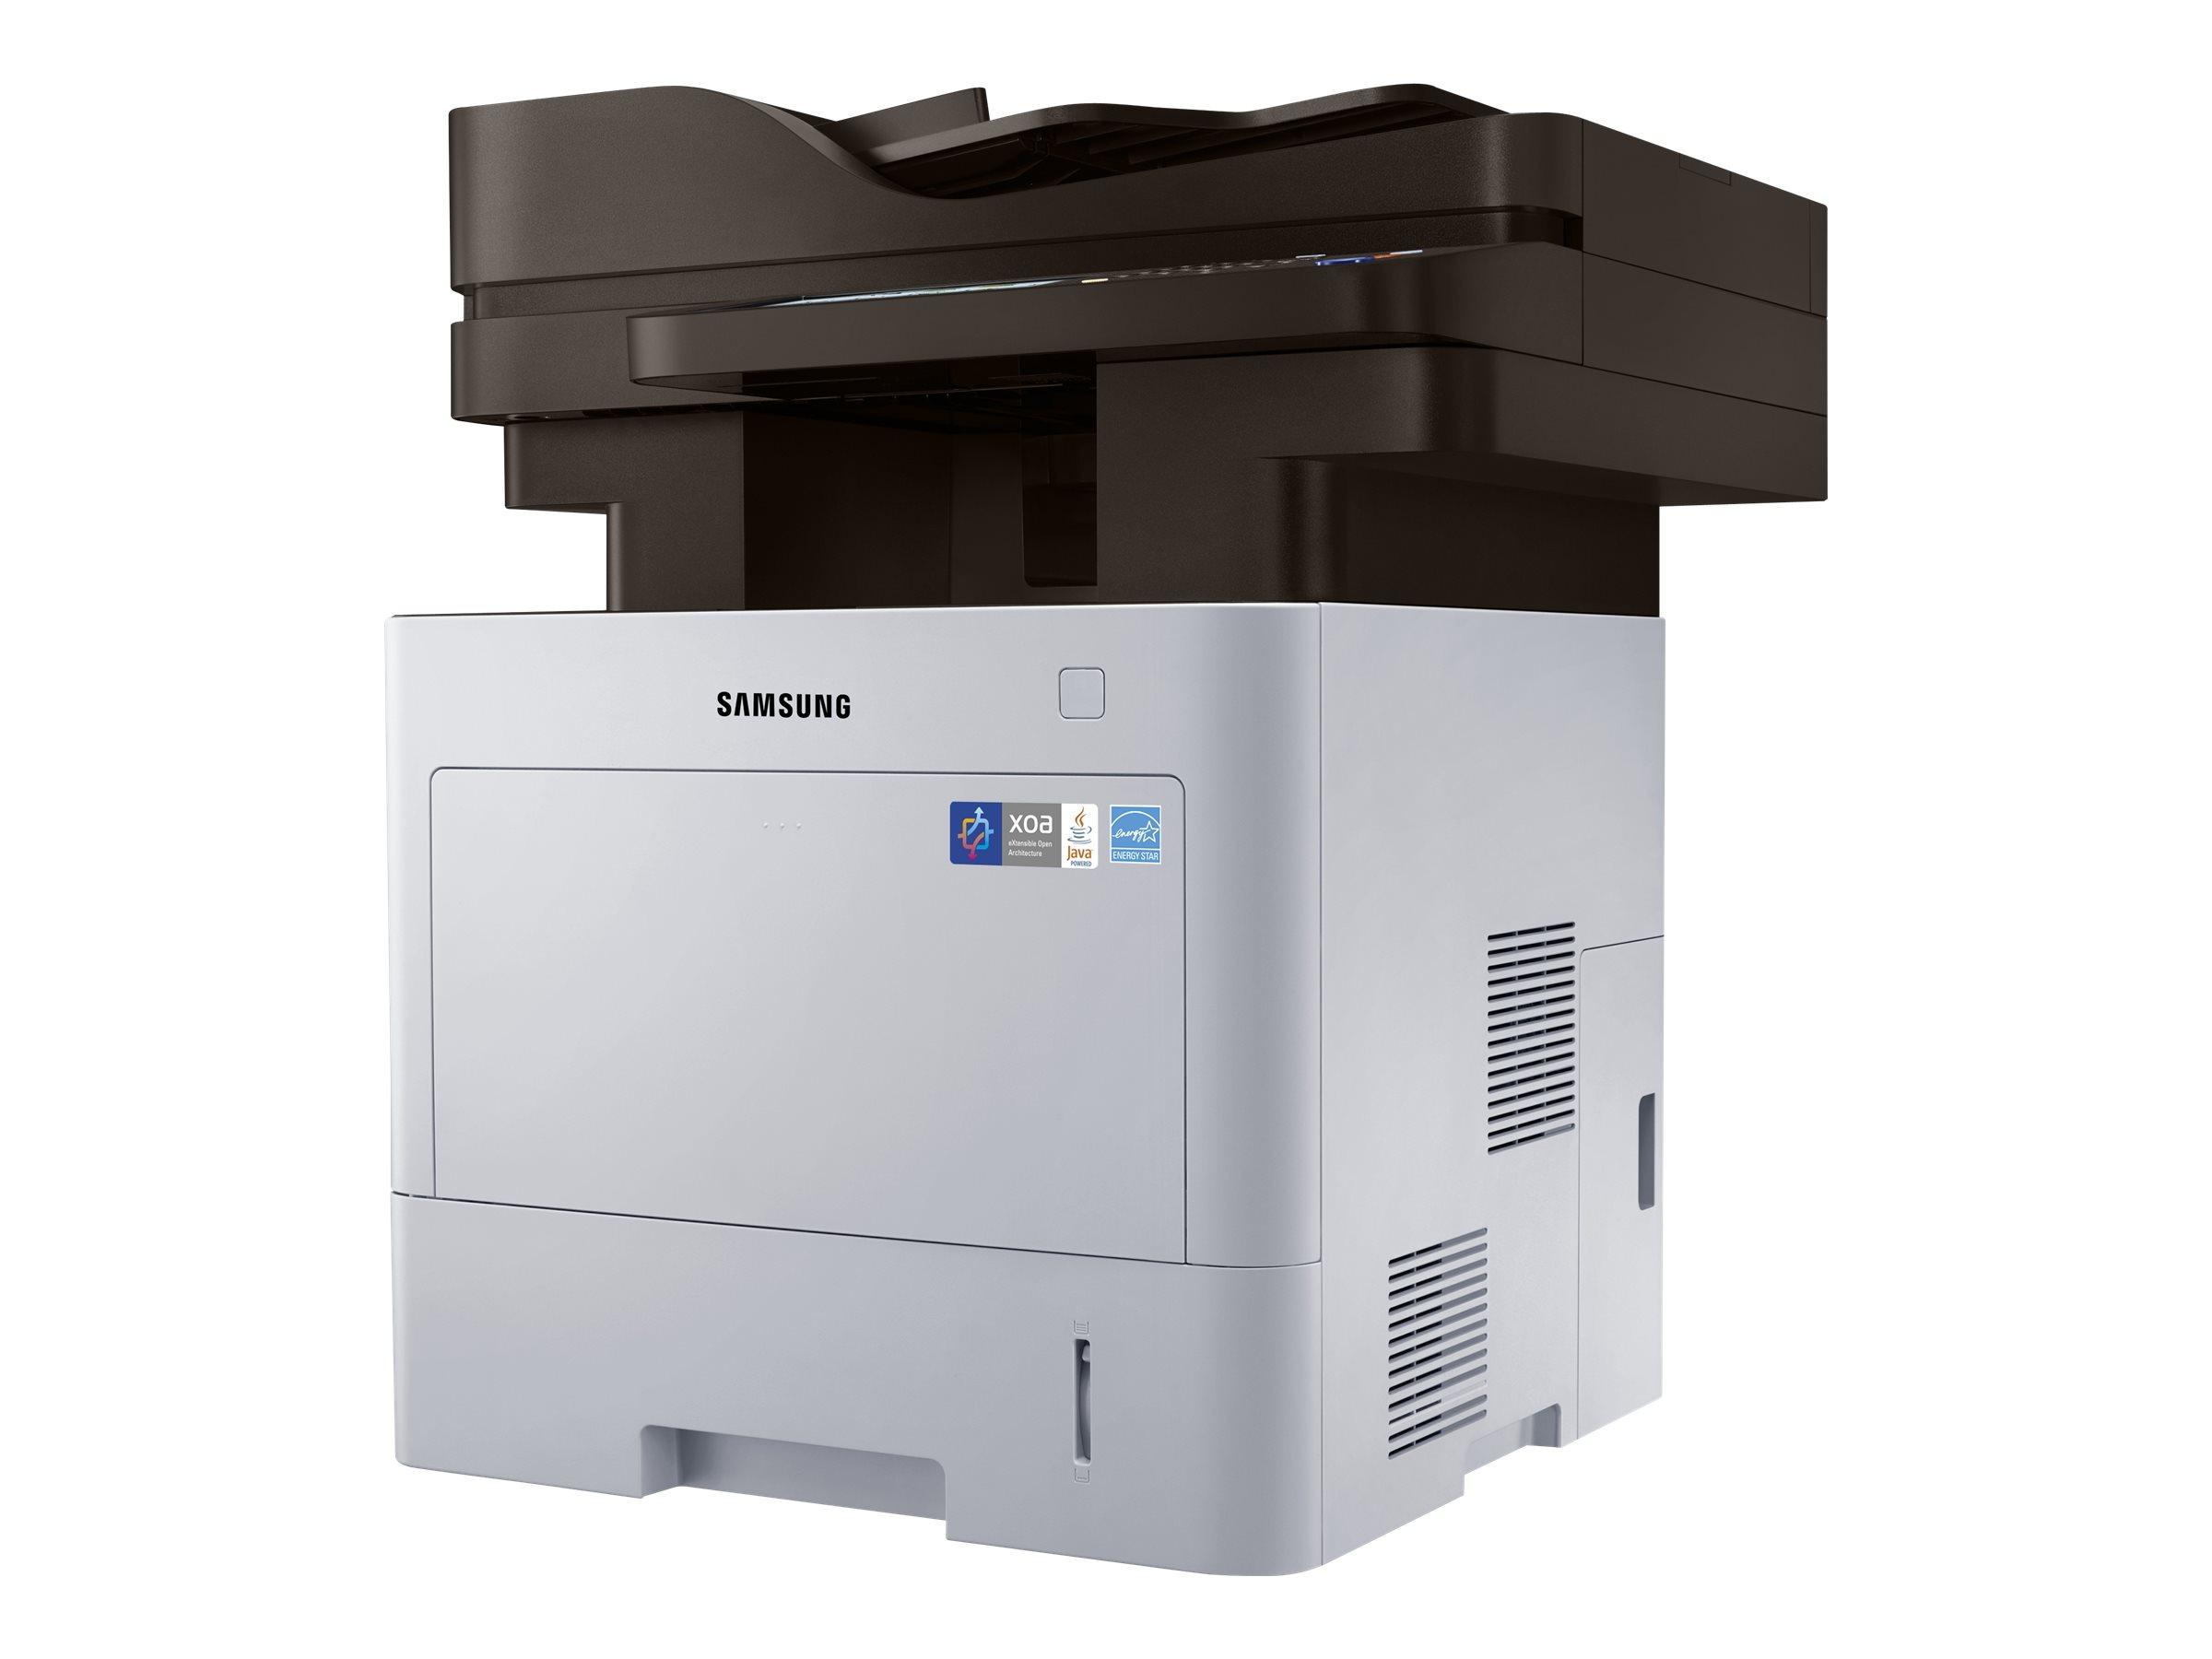 Samsung ProXpress SL-M4080FX - Multifunktionsdrucker - s/w - Laser - Legal (216 x 356 mm) (Original) - A4/Legal (Medien)